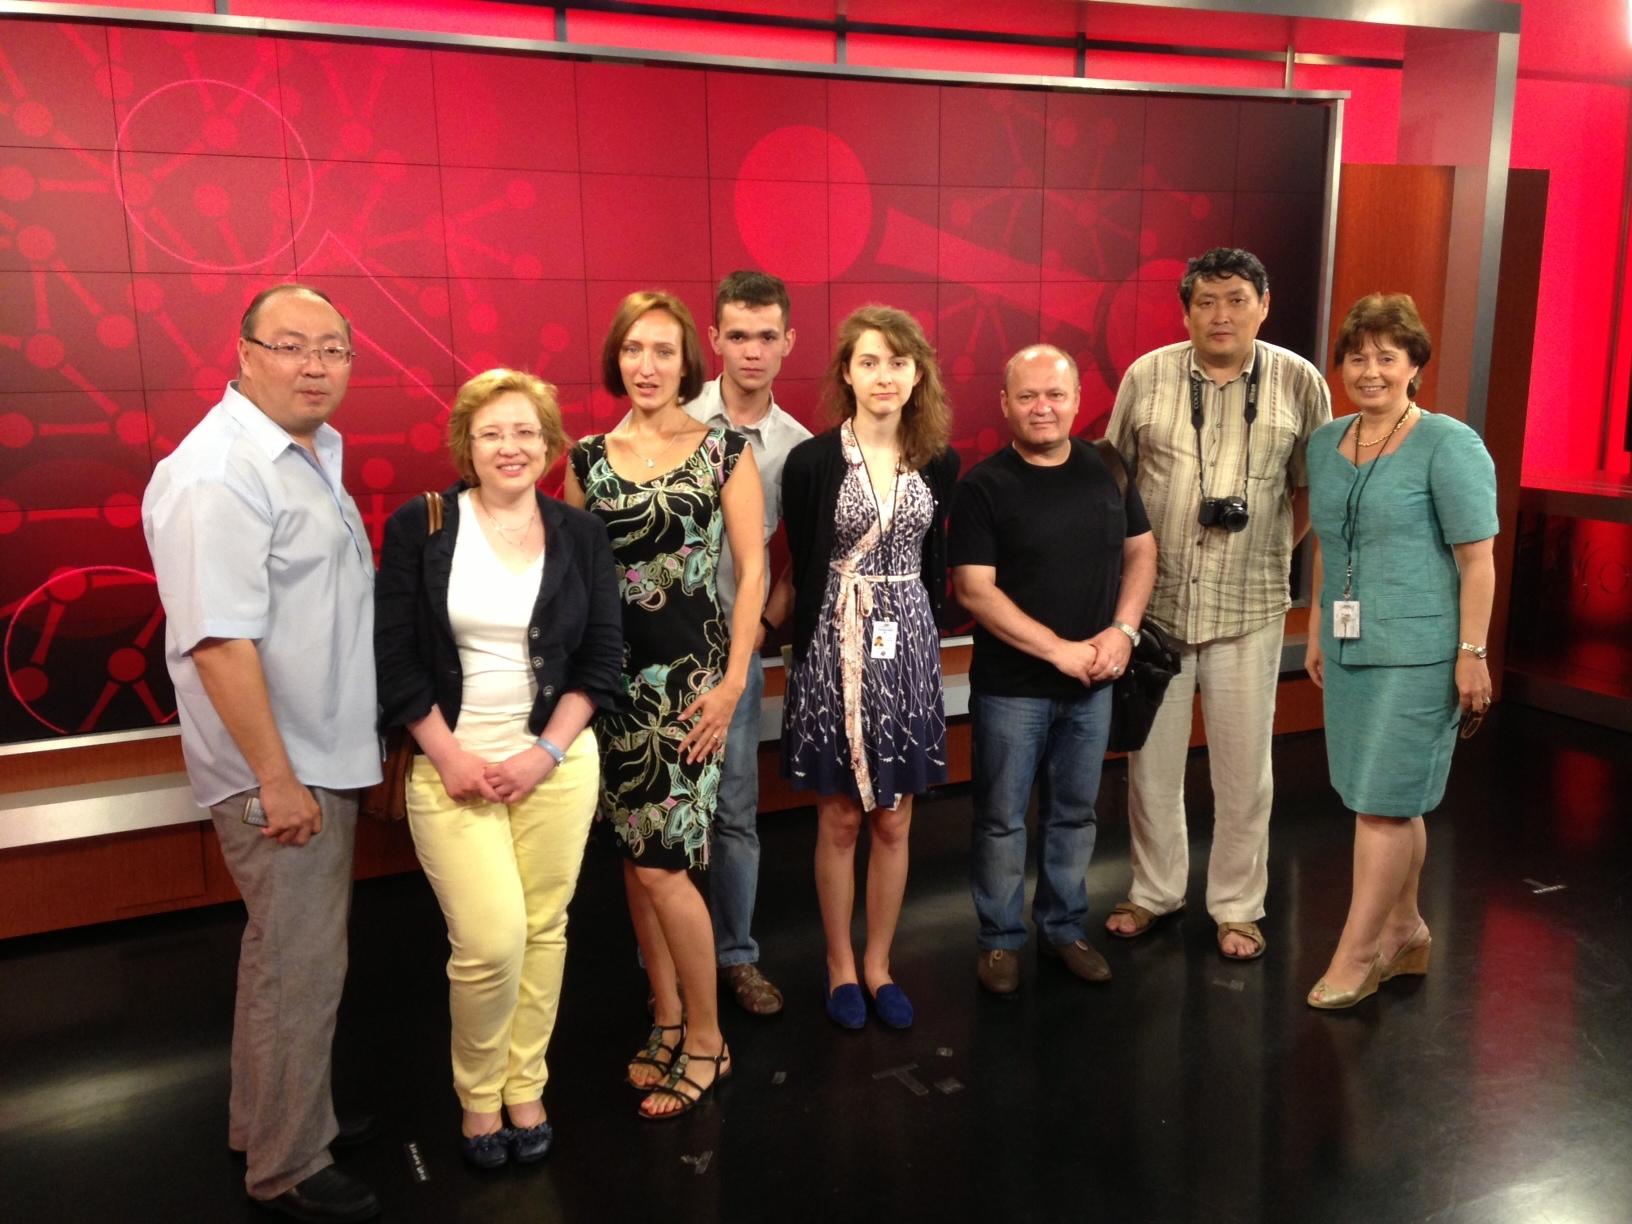 VOA welcomes Russian journalists